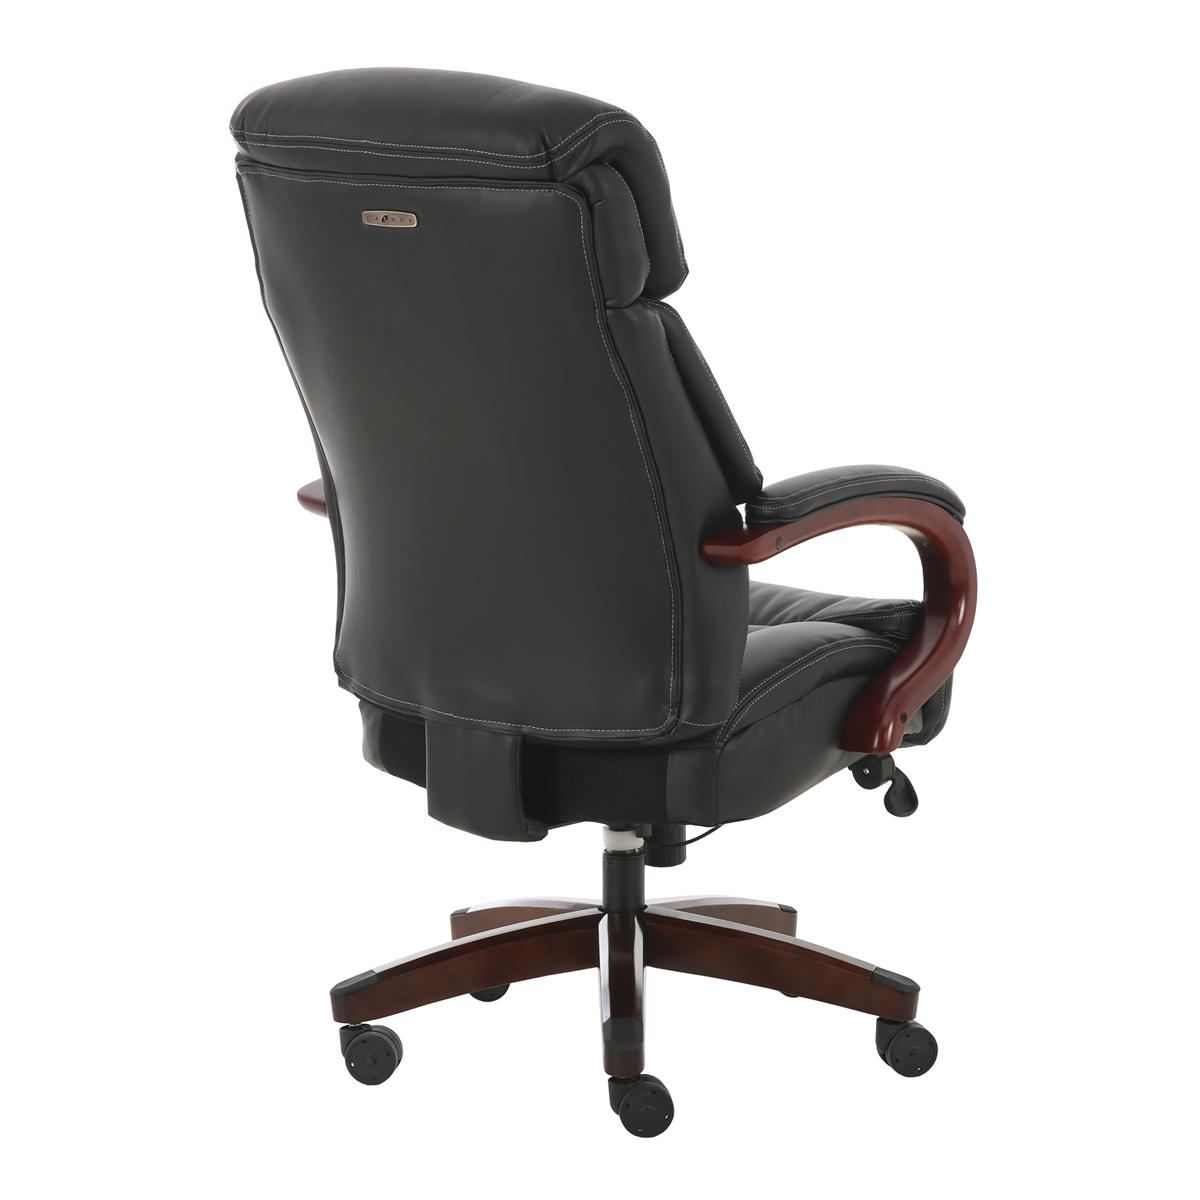 Ergonomic Office Chair High Back Executive Swivel Folding